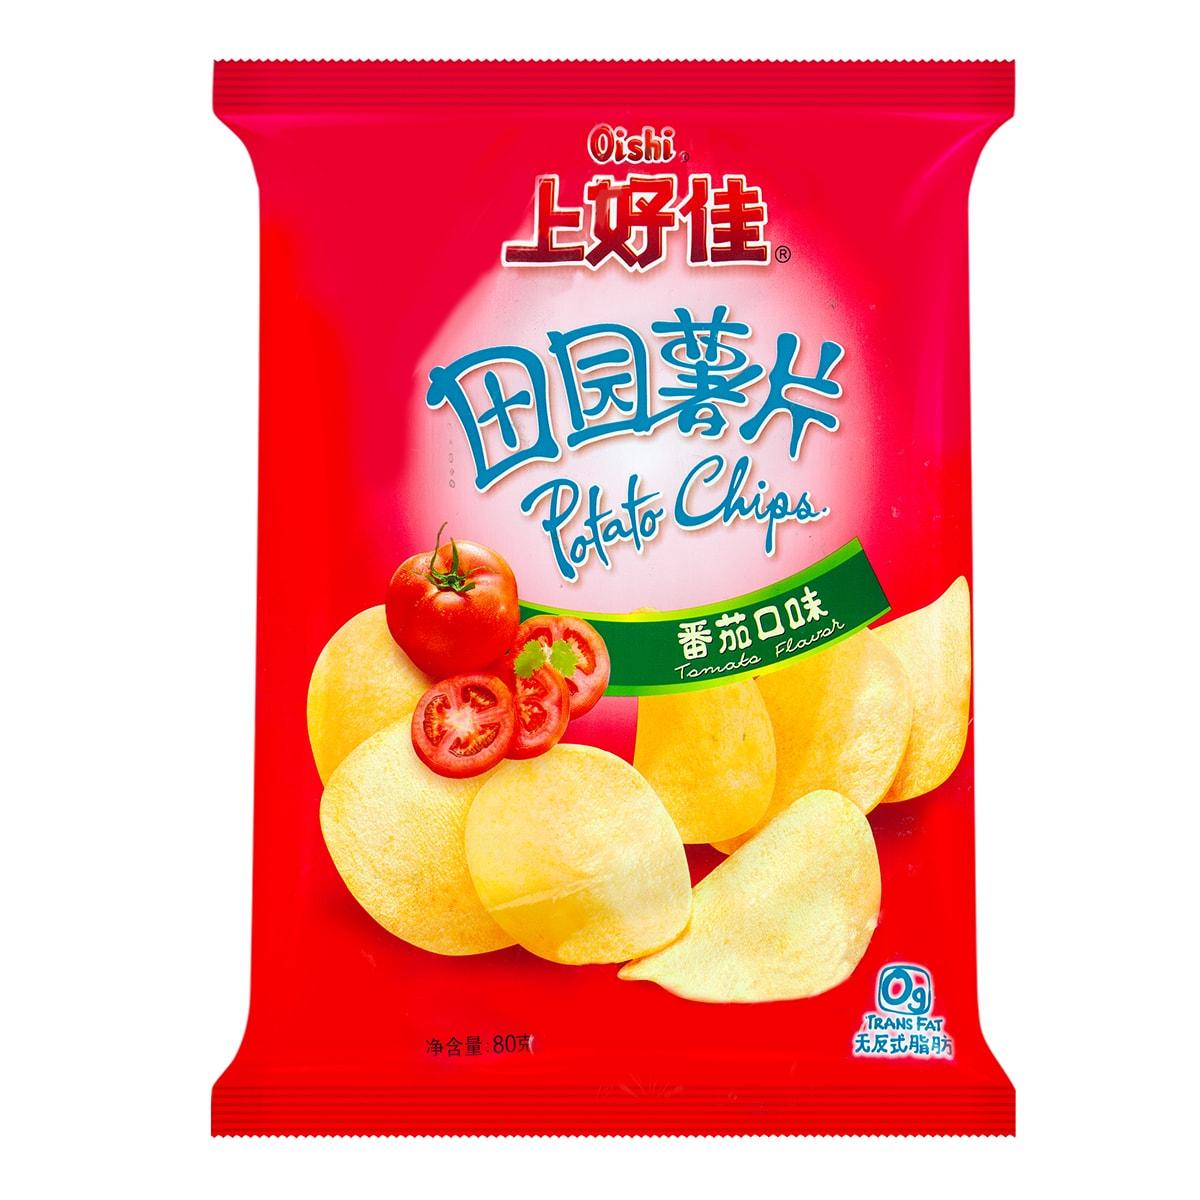 OISHI上好佳 田园薯片 番茄口味 80g